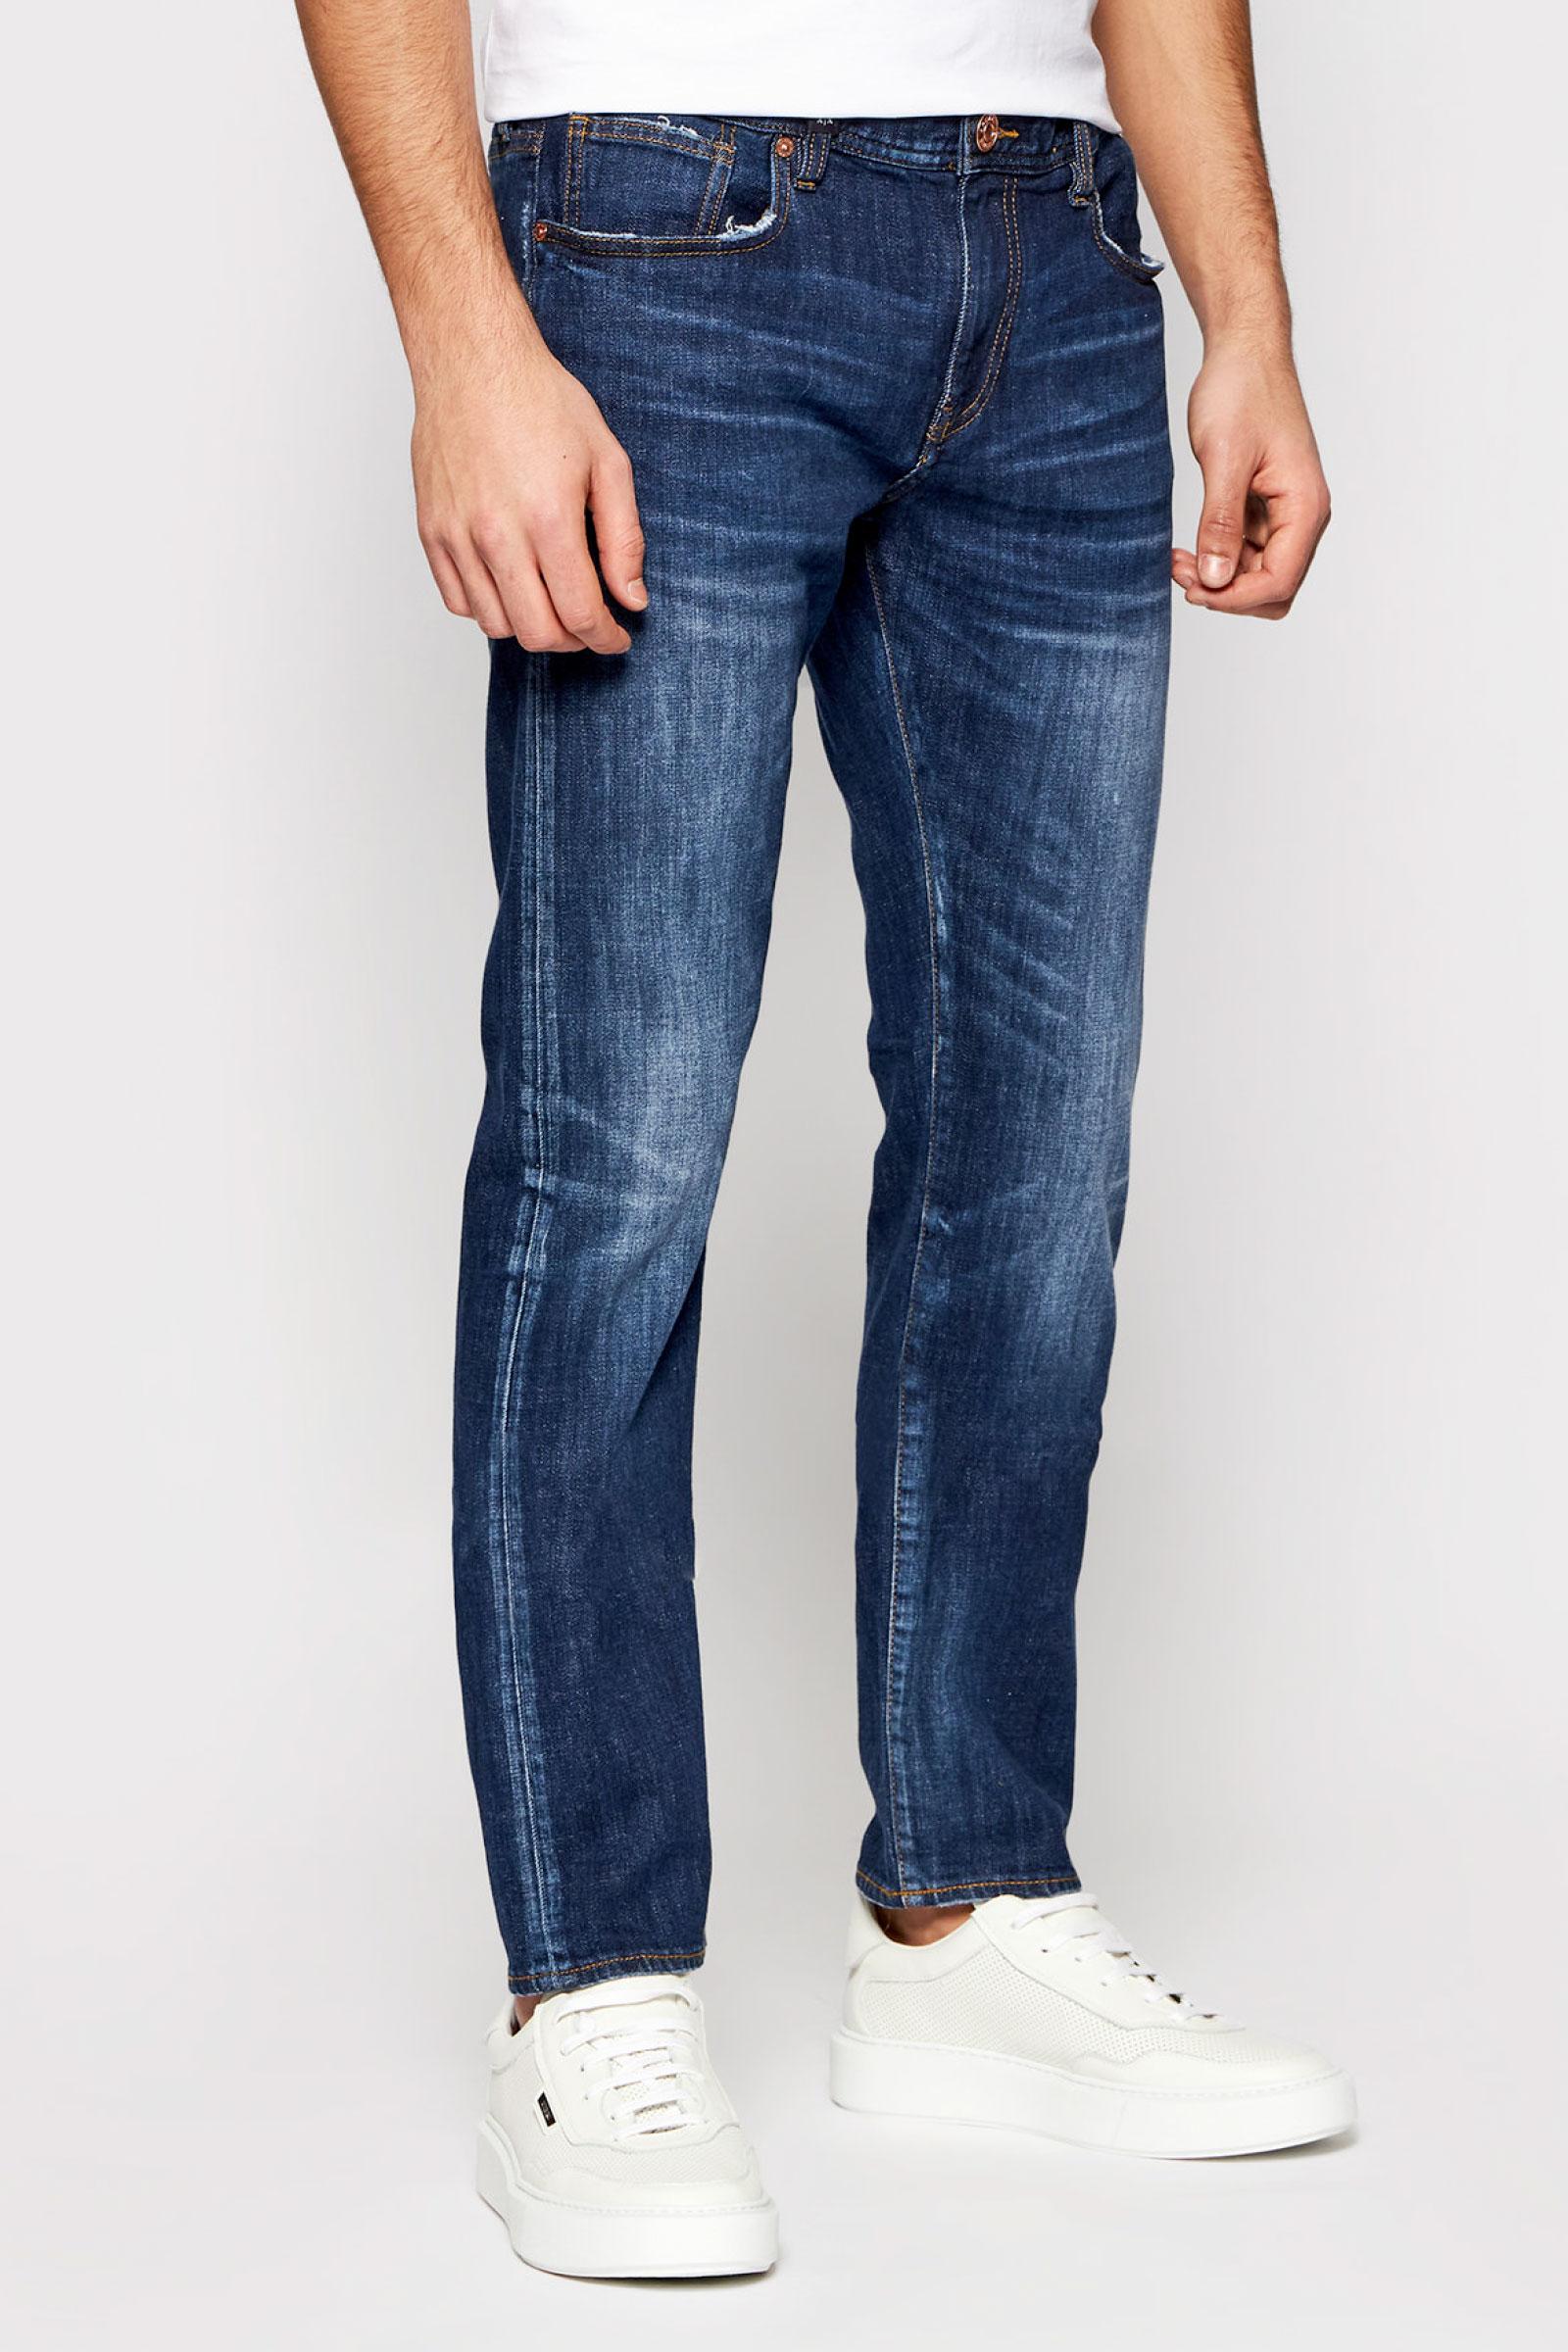 ARMANI EXCHANGE Jeans Uomo ARMANI EXCHANGE | Jeans | 3KZJ13 Z1LTZ1500